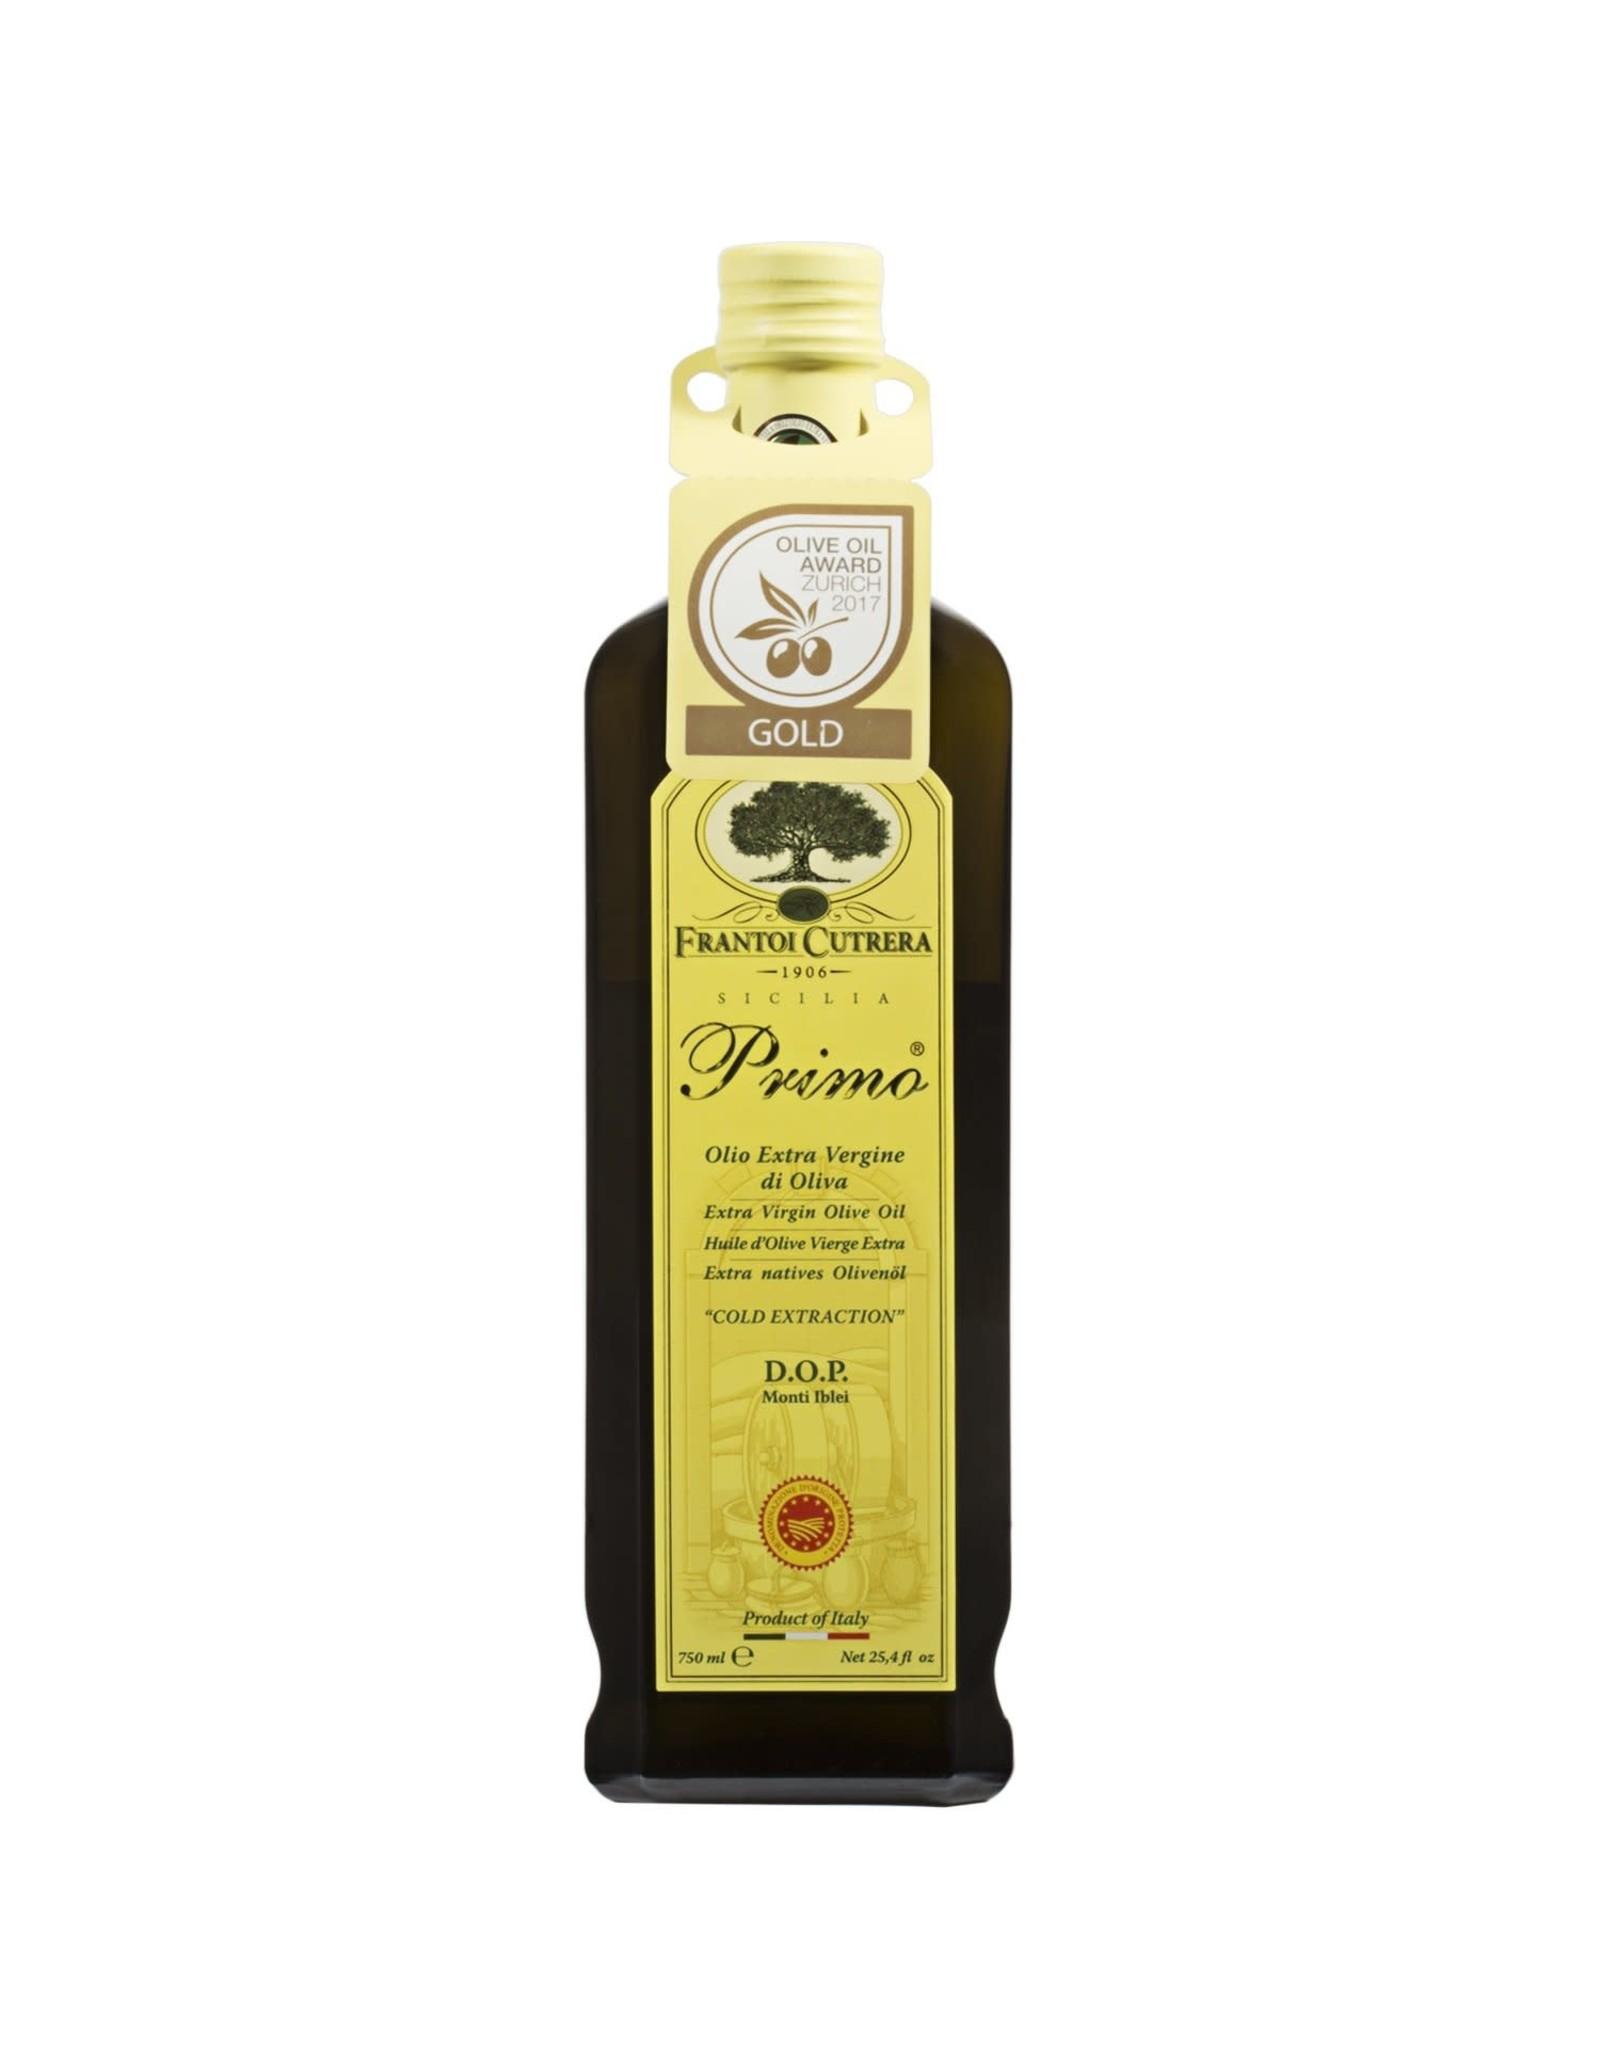 Frantoi Cutrera Frantoi Cutrera Primo DOP Monti Iblei Extra Virgin Olive Oil